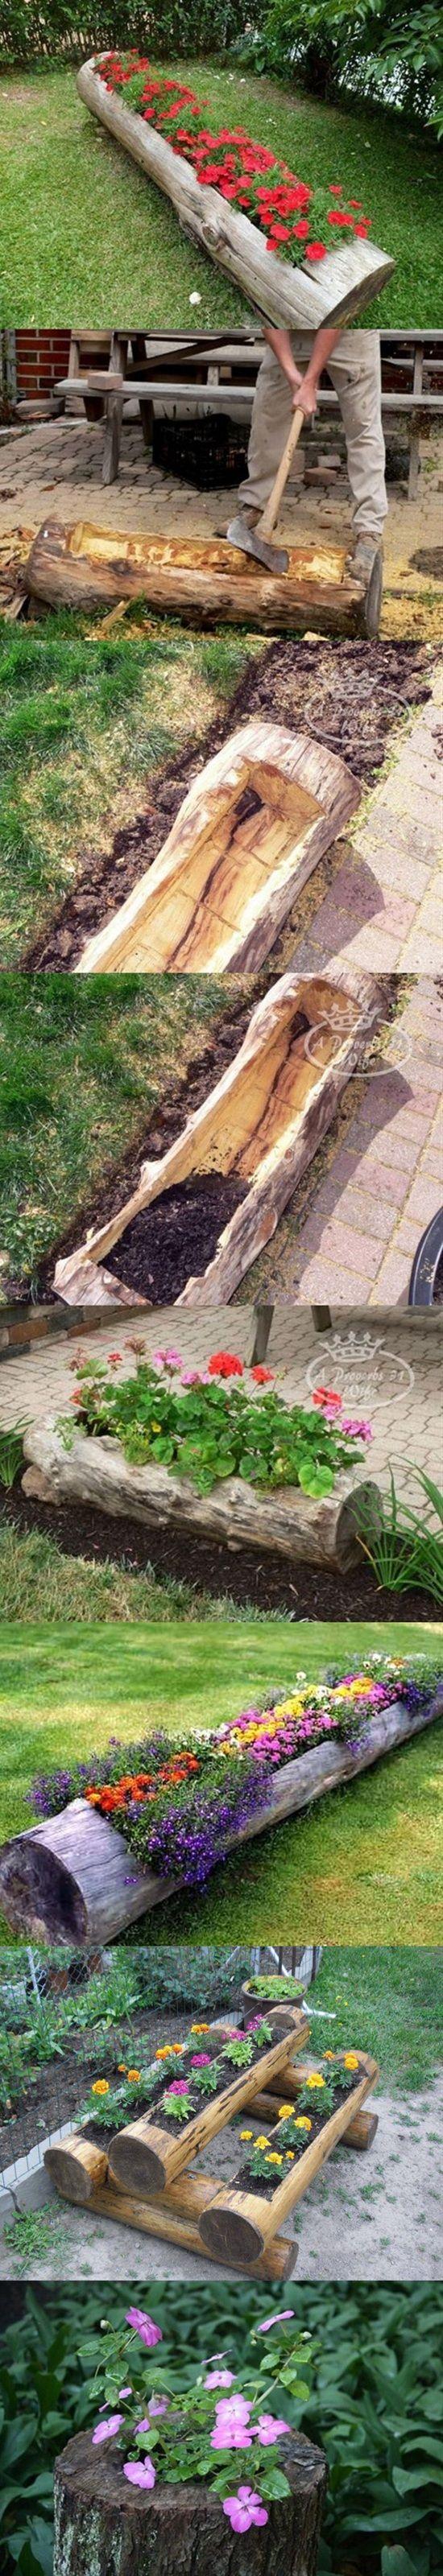 Make Beautiful Log Garden Planter: